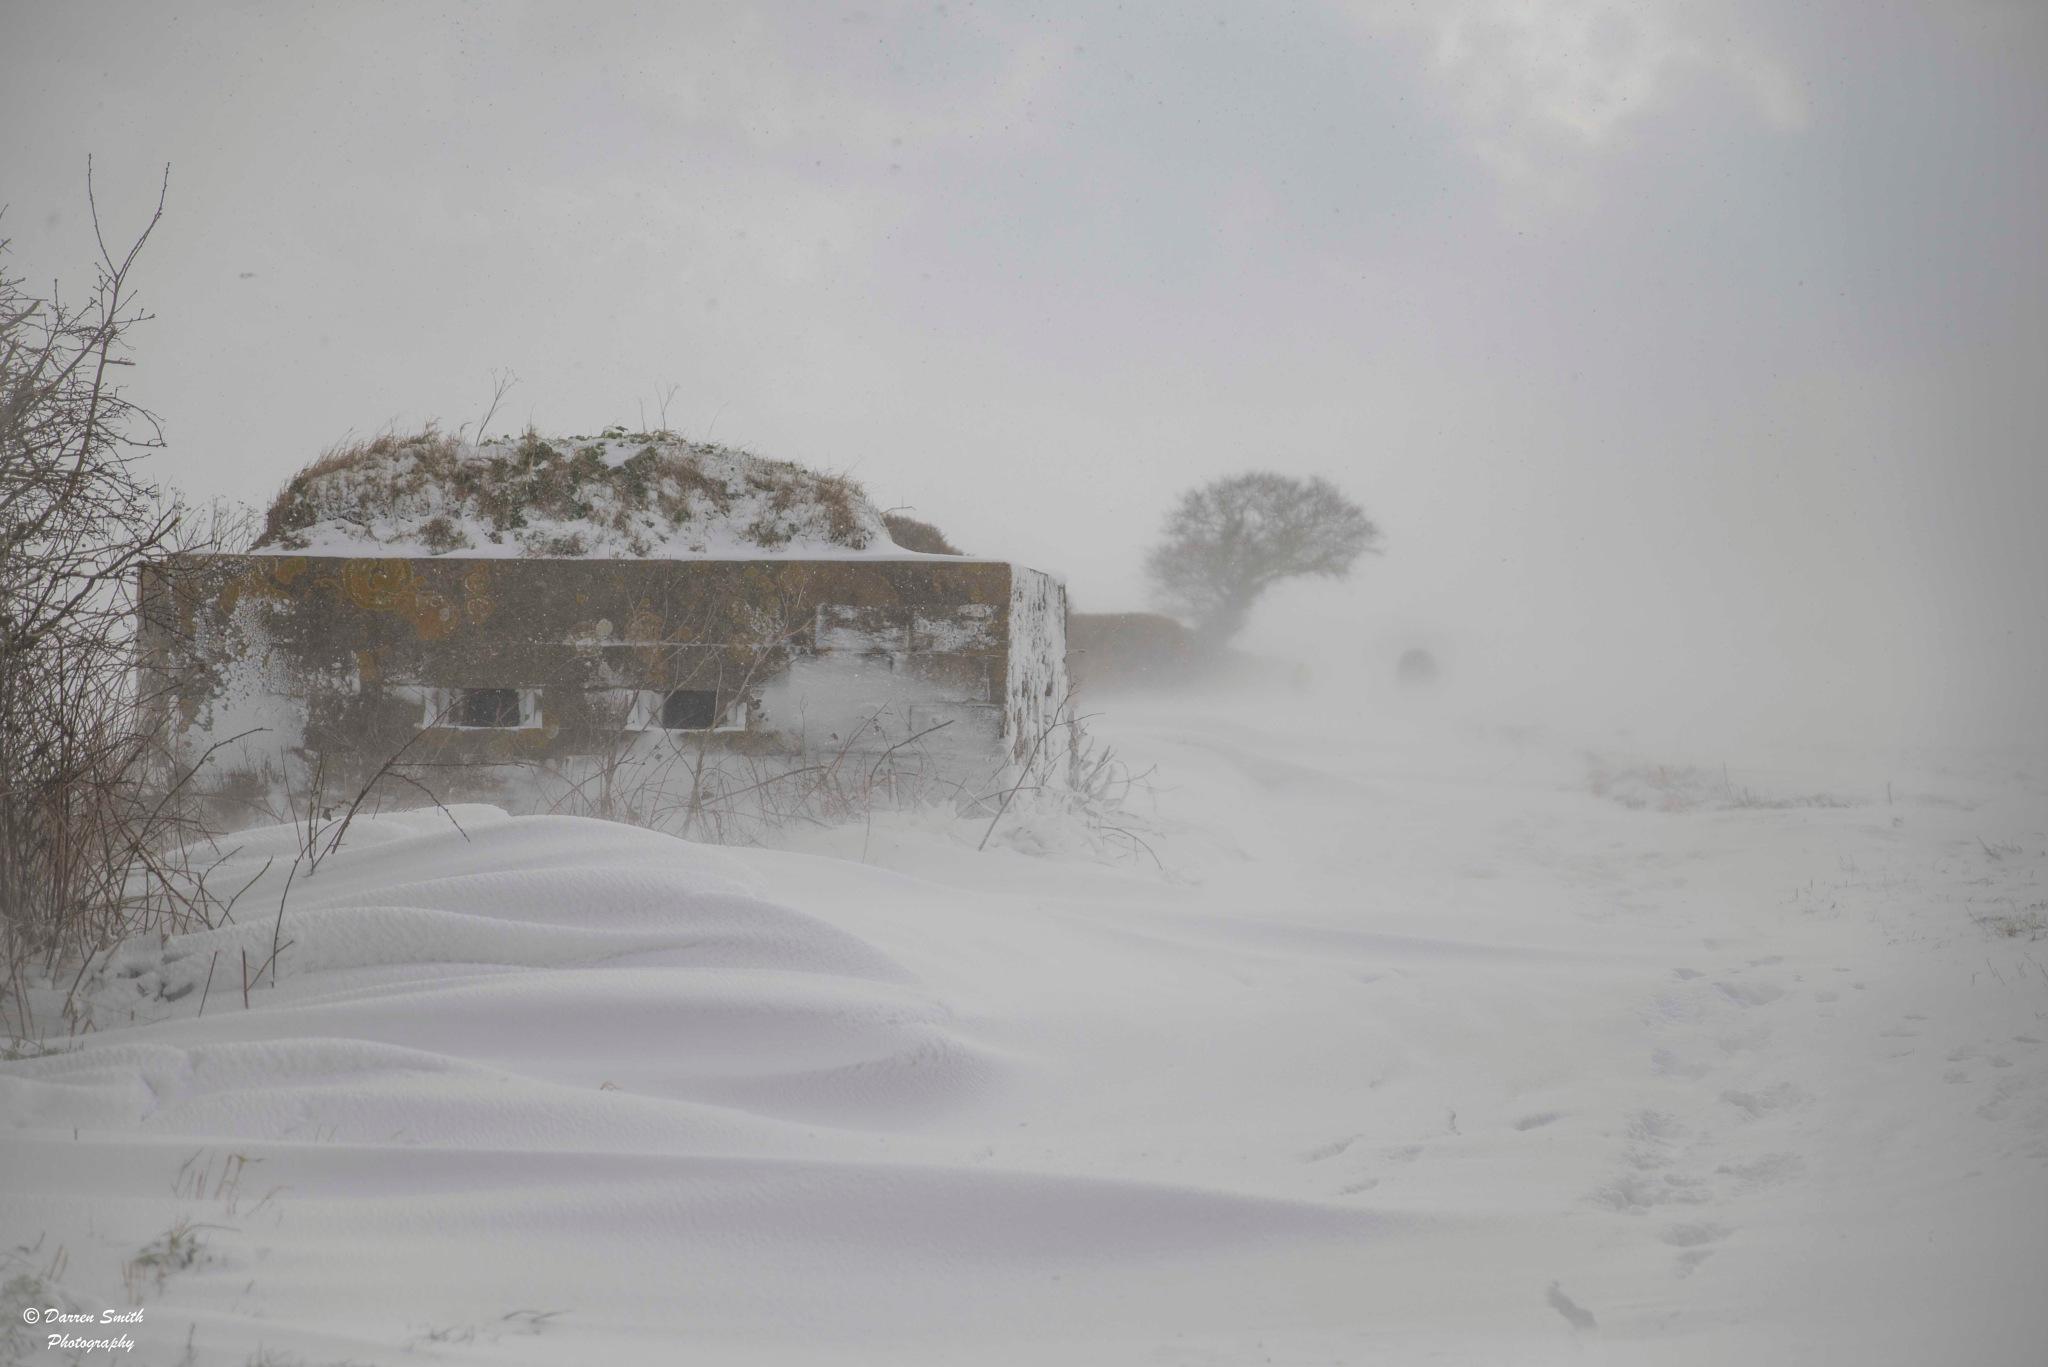 Blizzard by Darren Smith